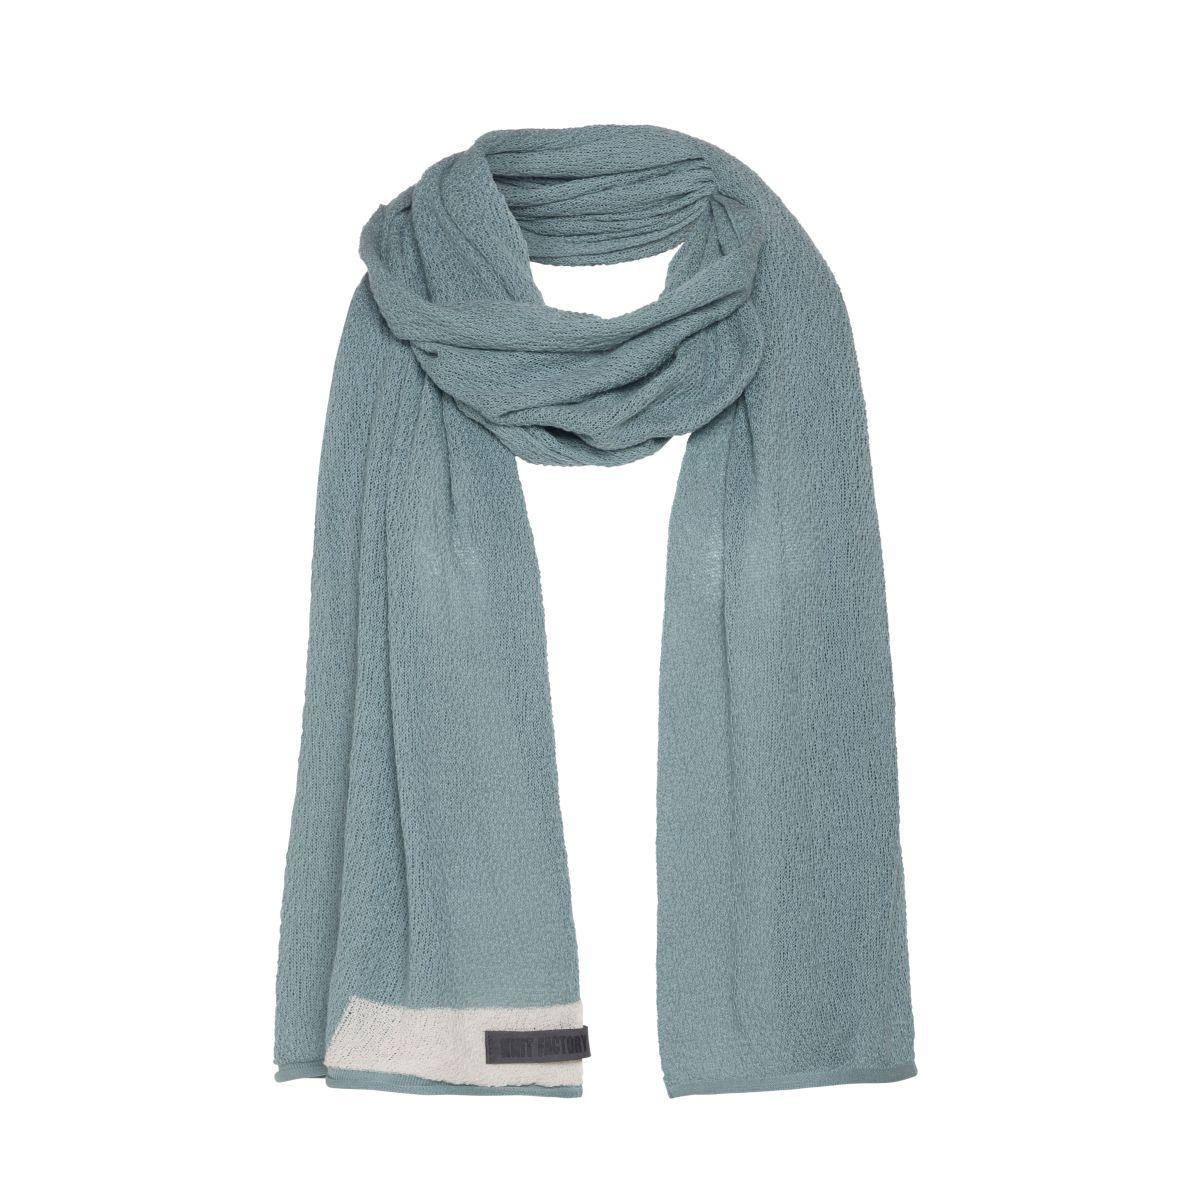 knit factory kf141065009 june sjaal stone green 1